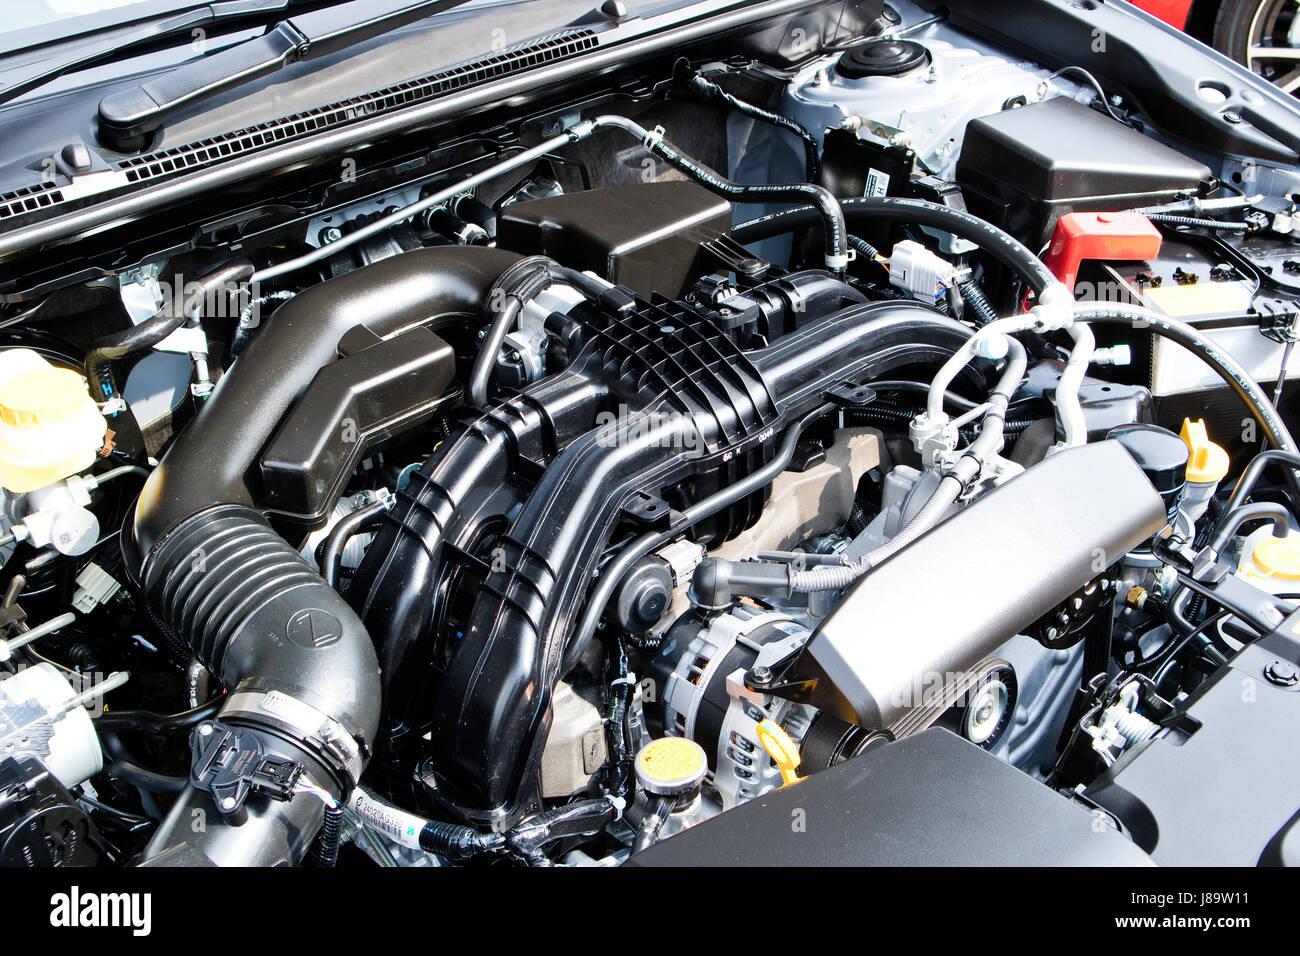 Hong Kong China Jan 13 2017 Subaru Impreza 2017 Engine On Jan 13